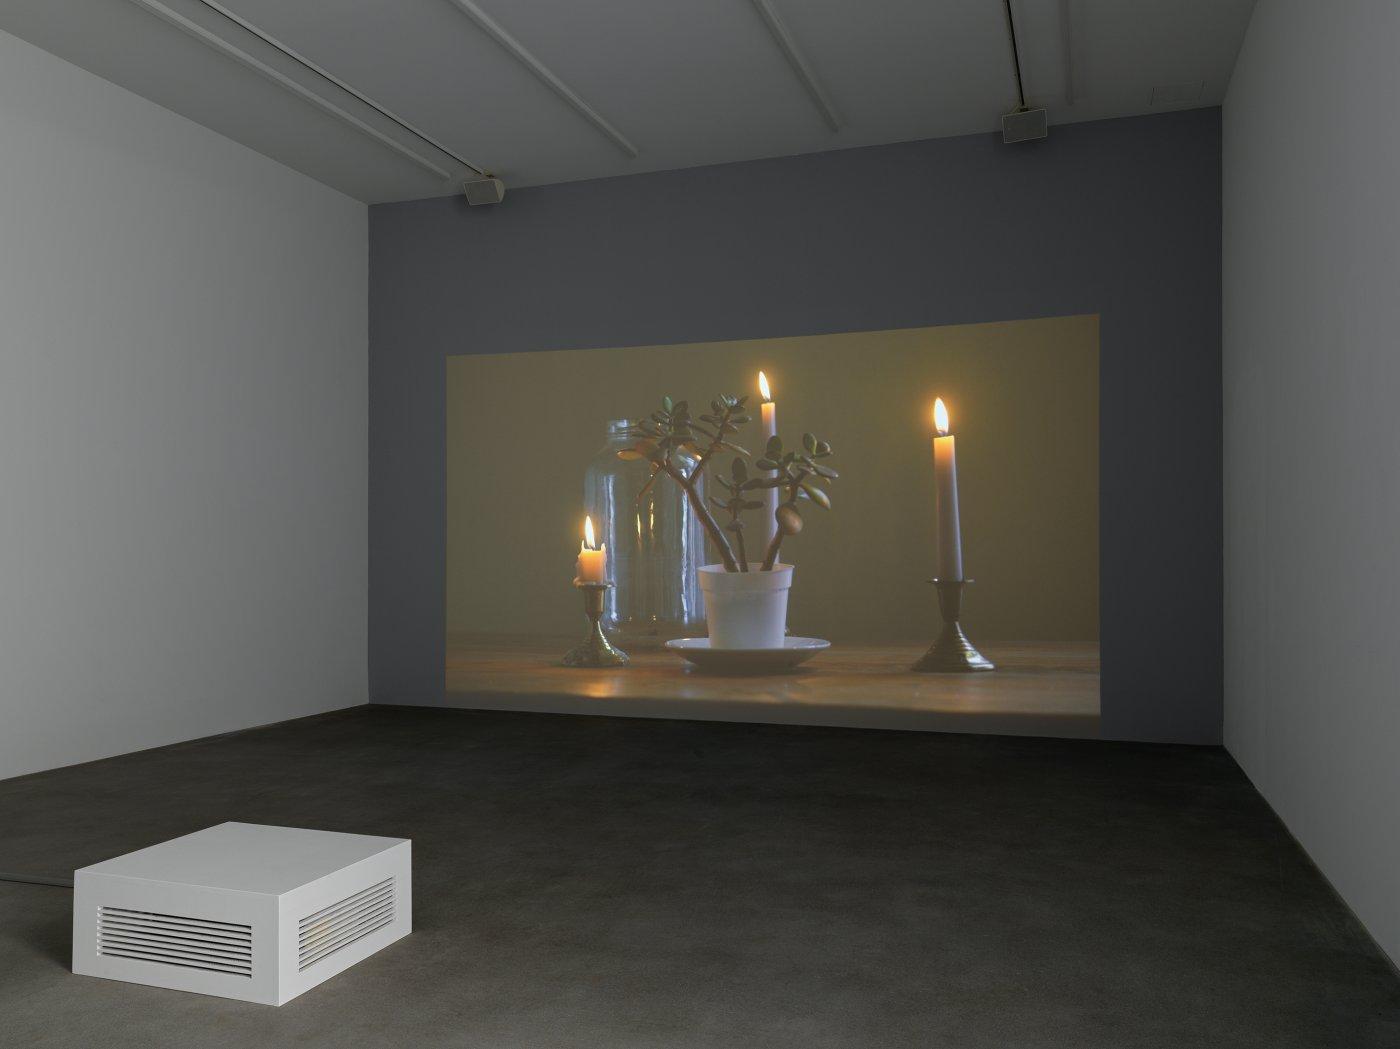 Galerie Eva Presenhuber Waldmanstrasse Torbjorn Rodland 7